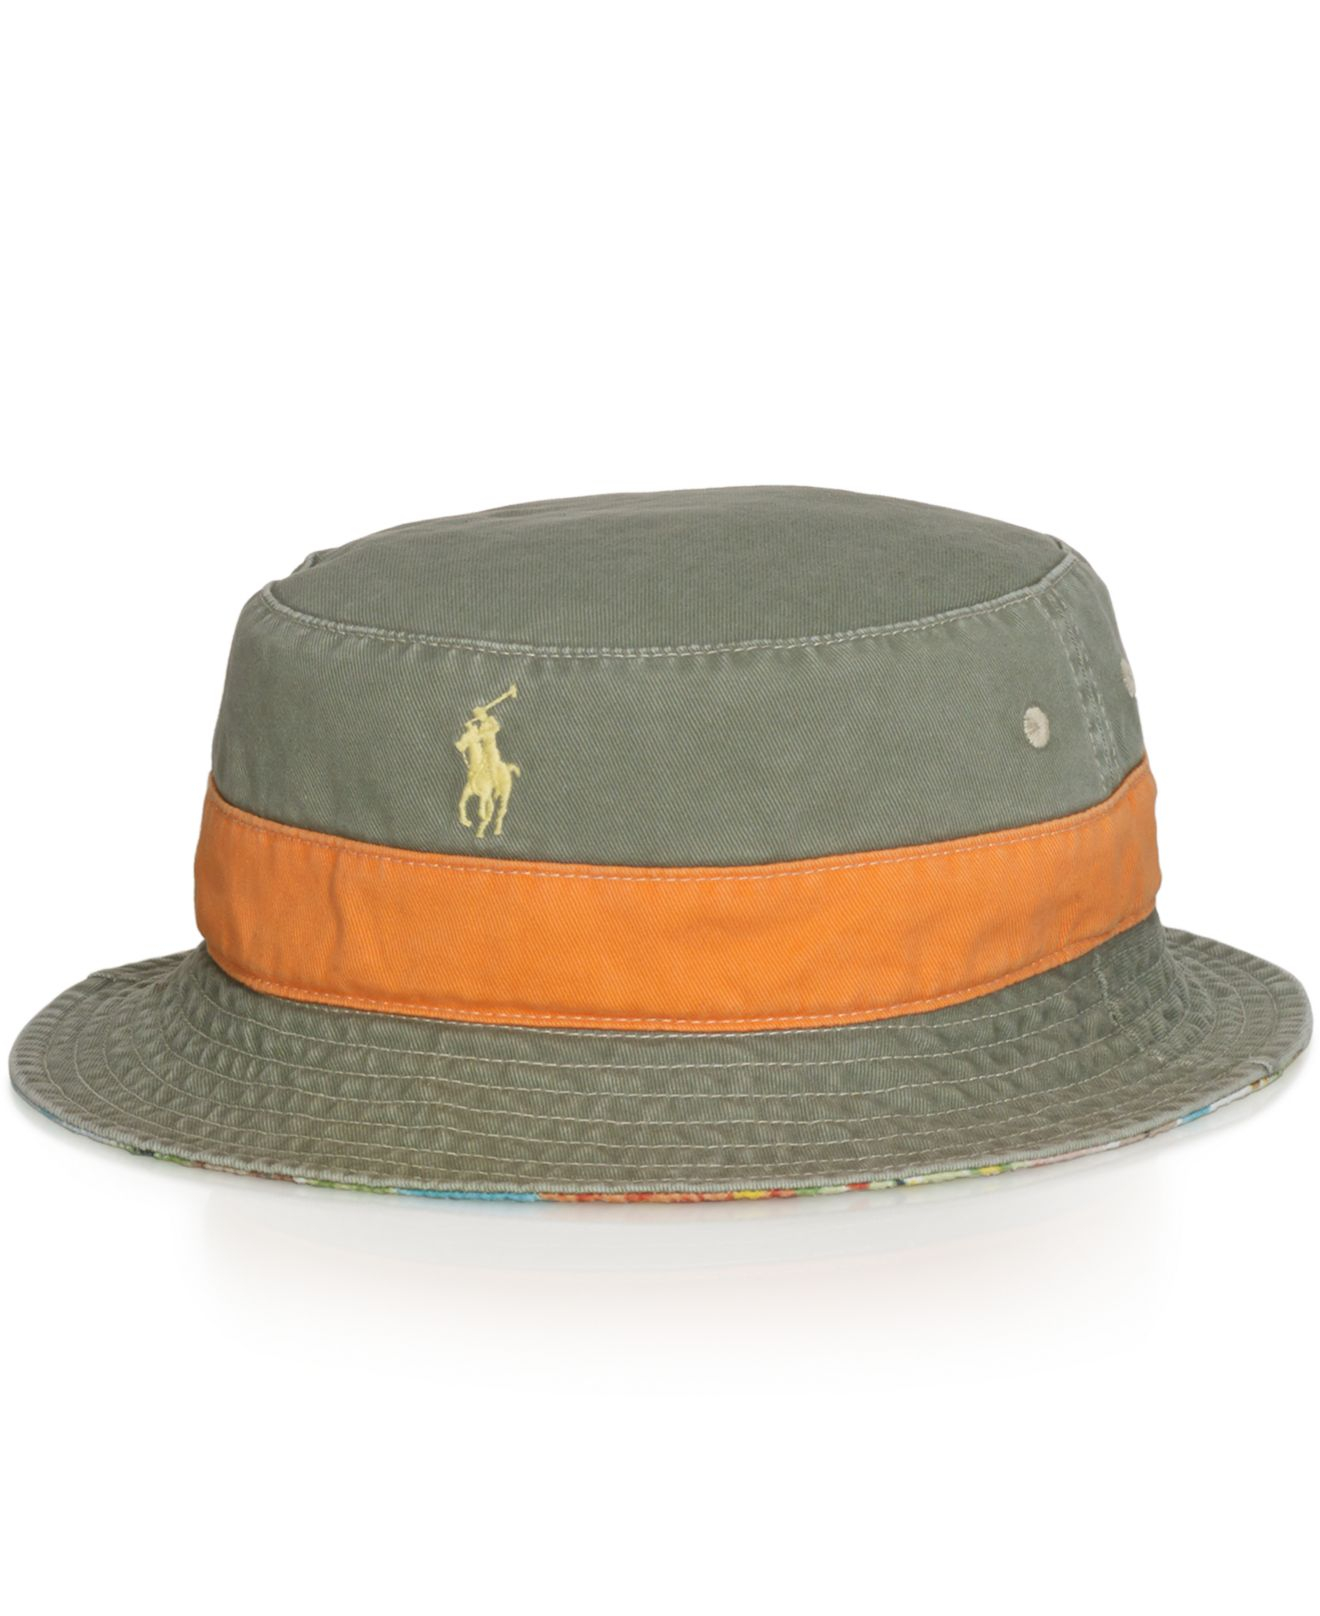 3ea21e8d6041d ... best price lyst polo ralph lauren reversible bucket hat for men 08b01  0e4f6